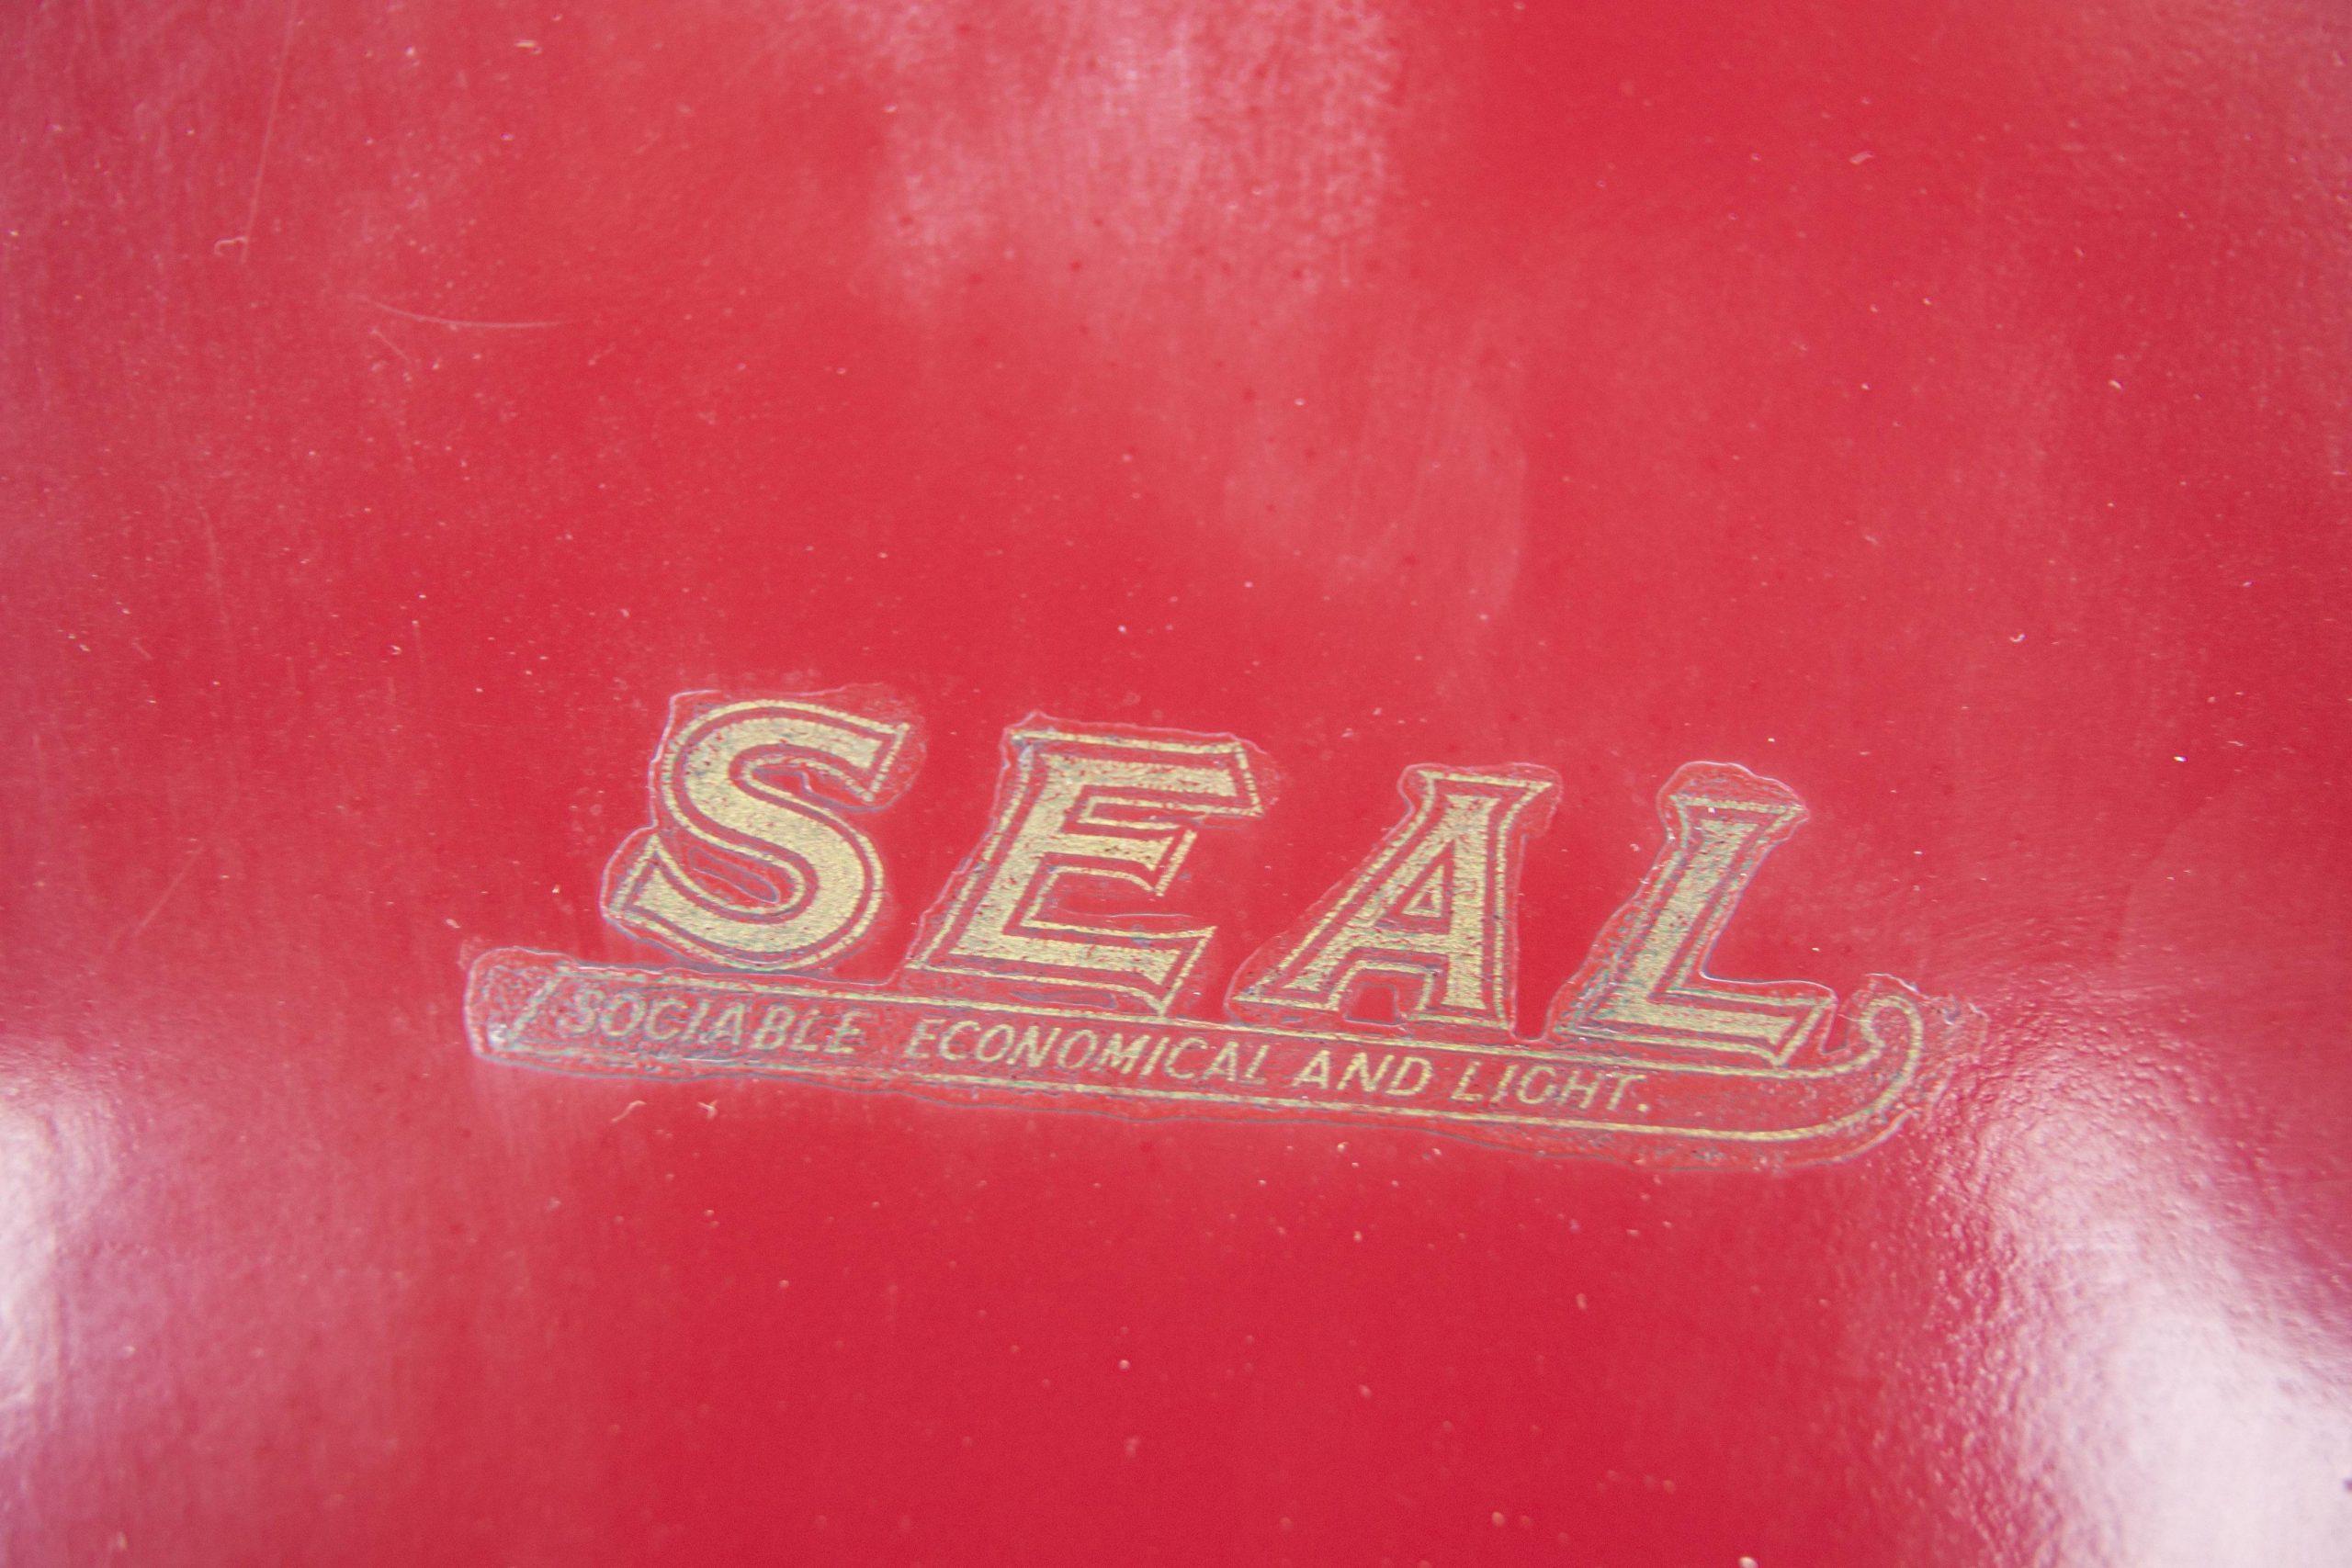 1925 Seal 980CC Motorcycle badge